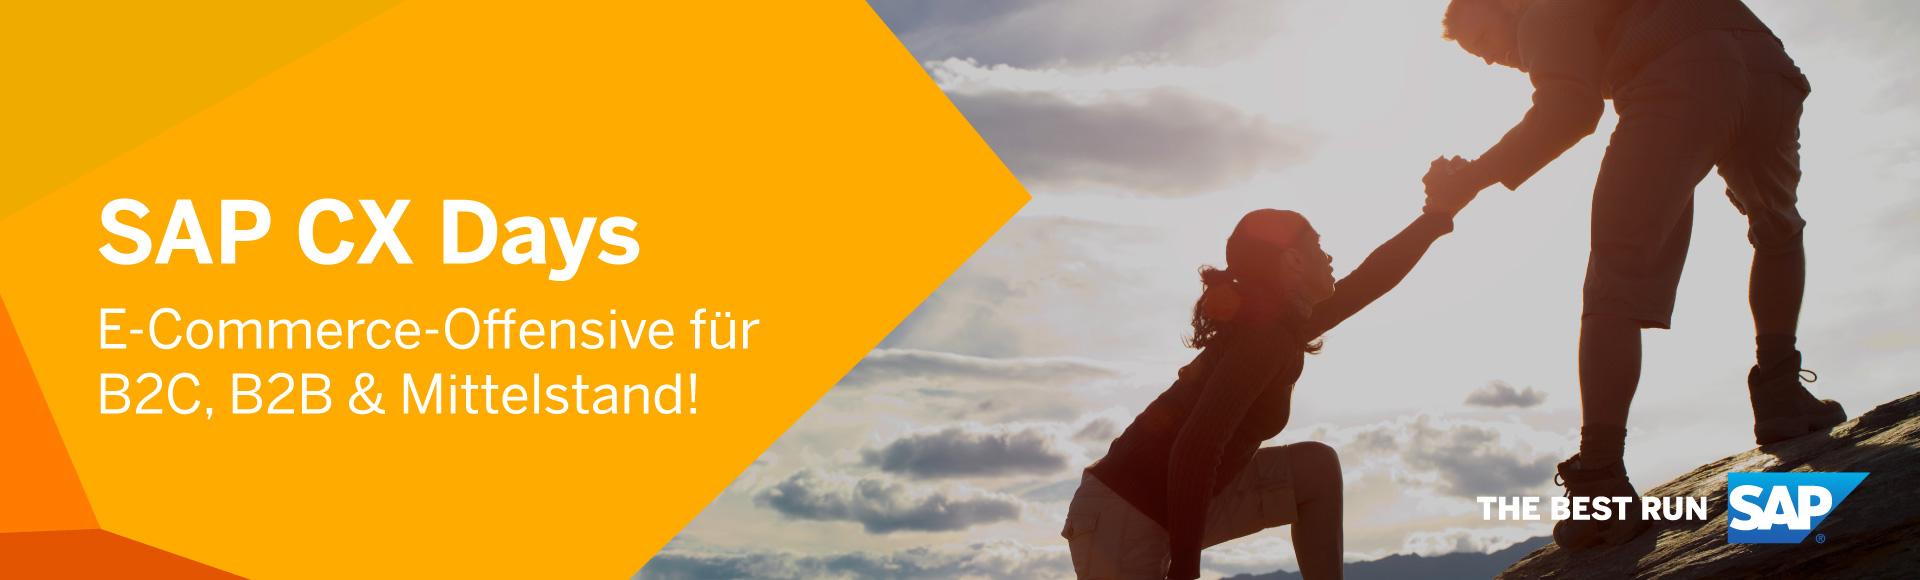 SAP CX Days 2021: Das Event zu den Themen CRM, E-Commerce, Customer Experience, Personalisierung.